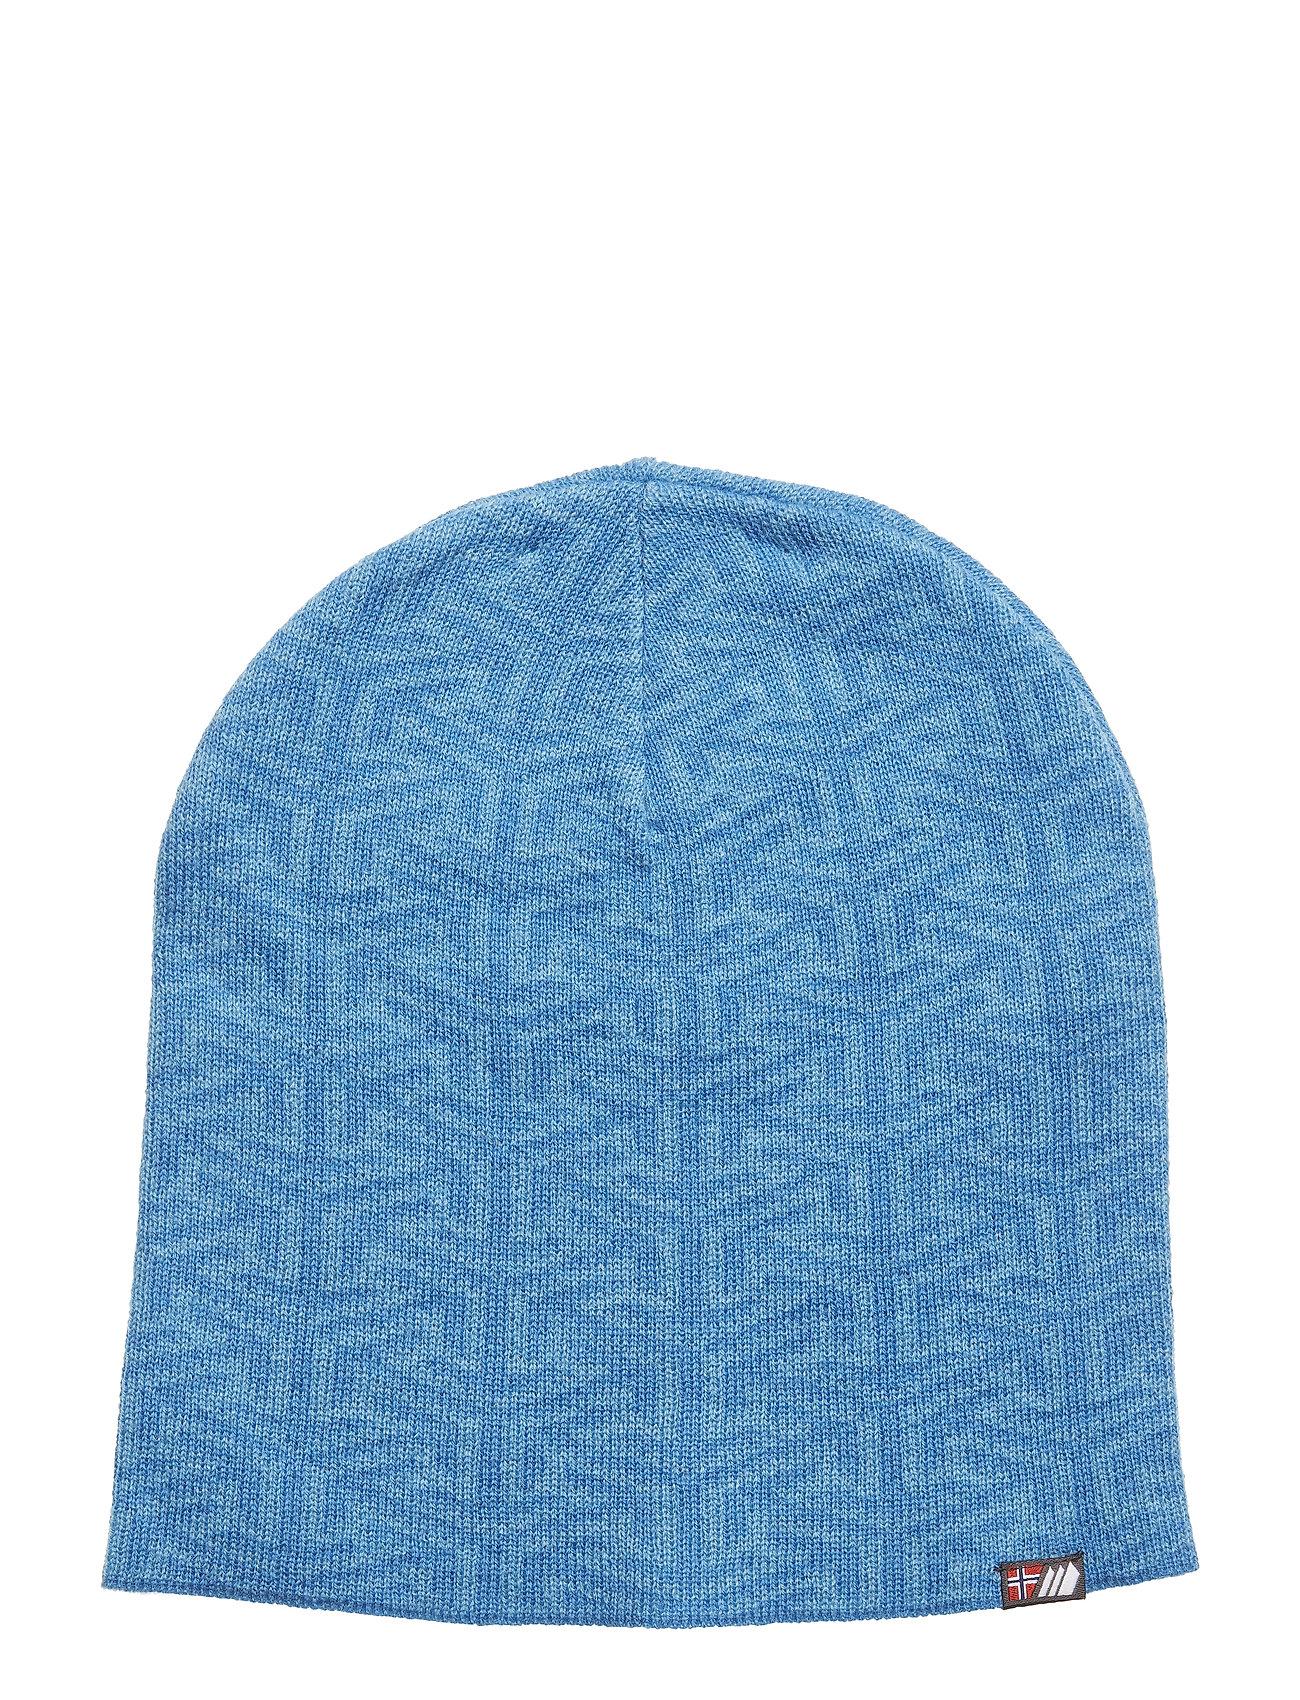 Image of Maradalen Knitted Hat Hat Blå SKOGSTAD (3075041281)